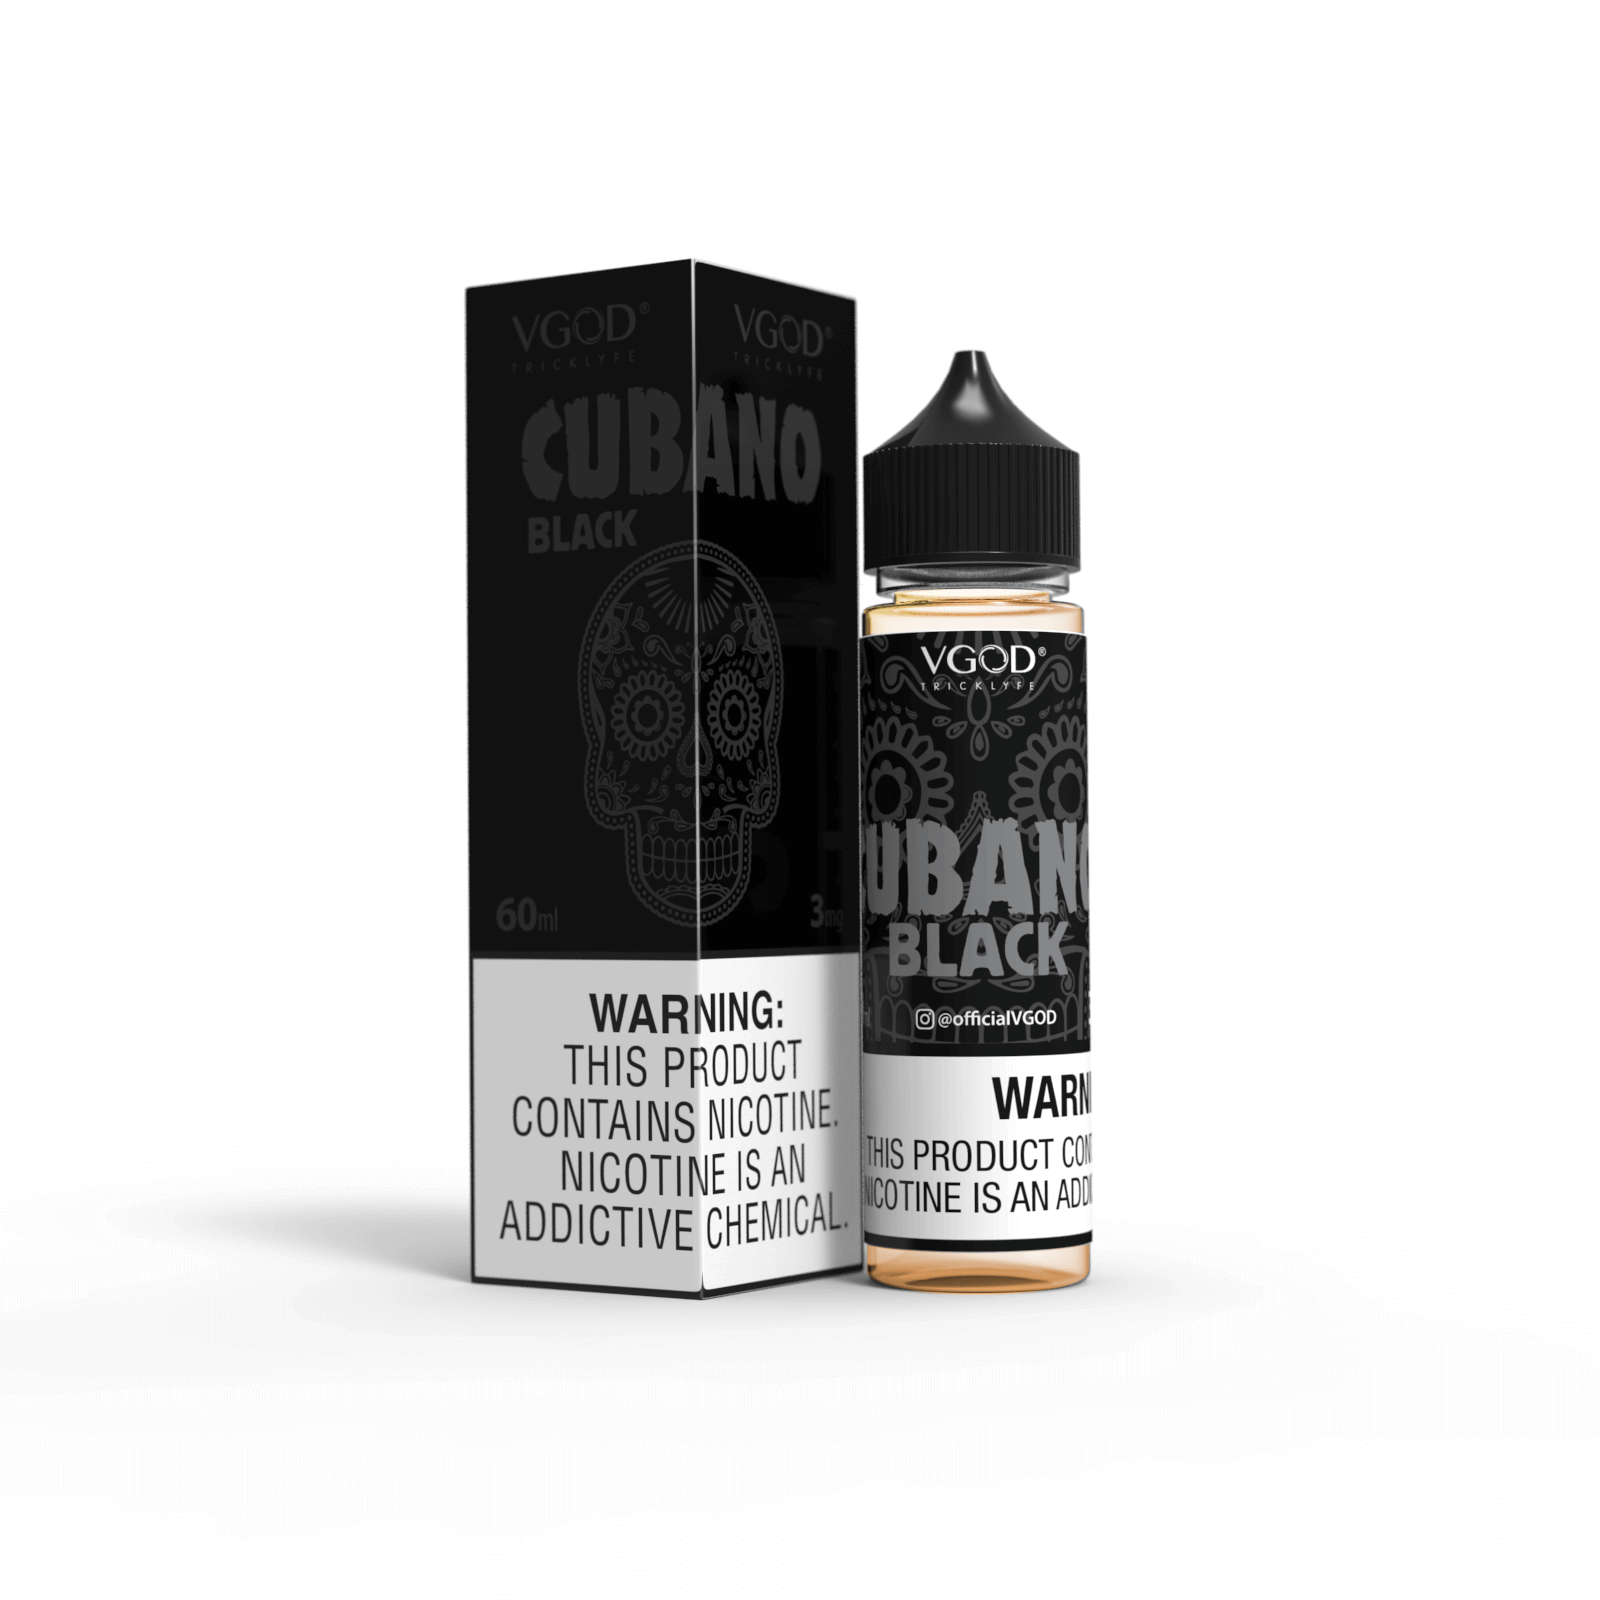 VGOD, Cubano Black